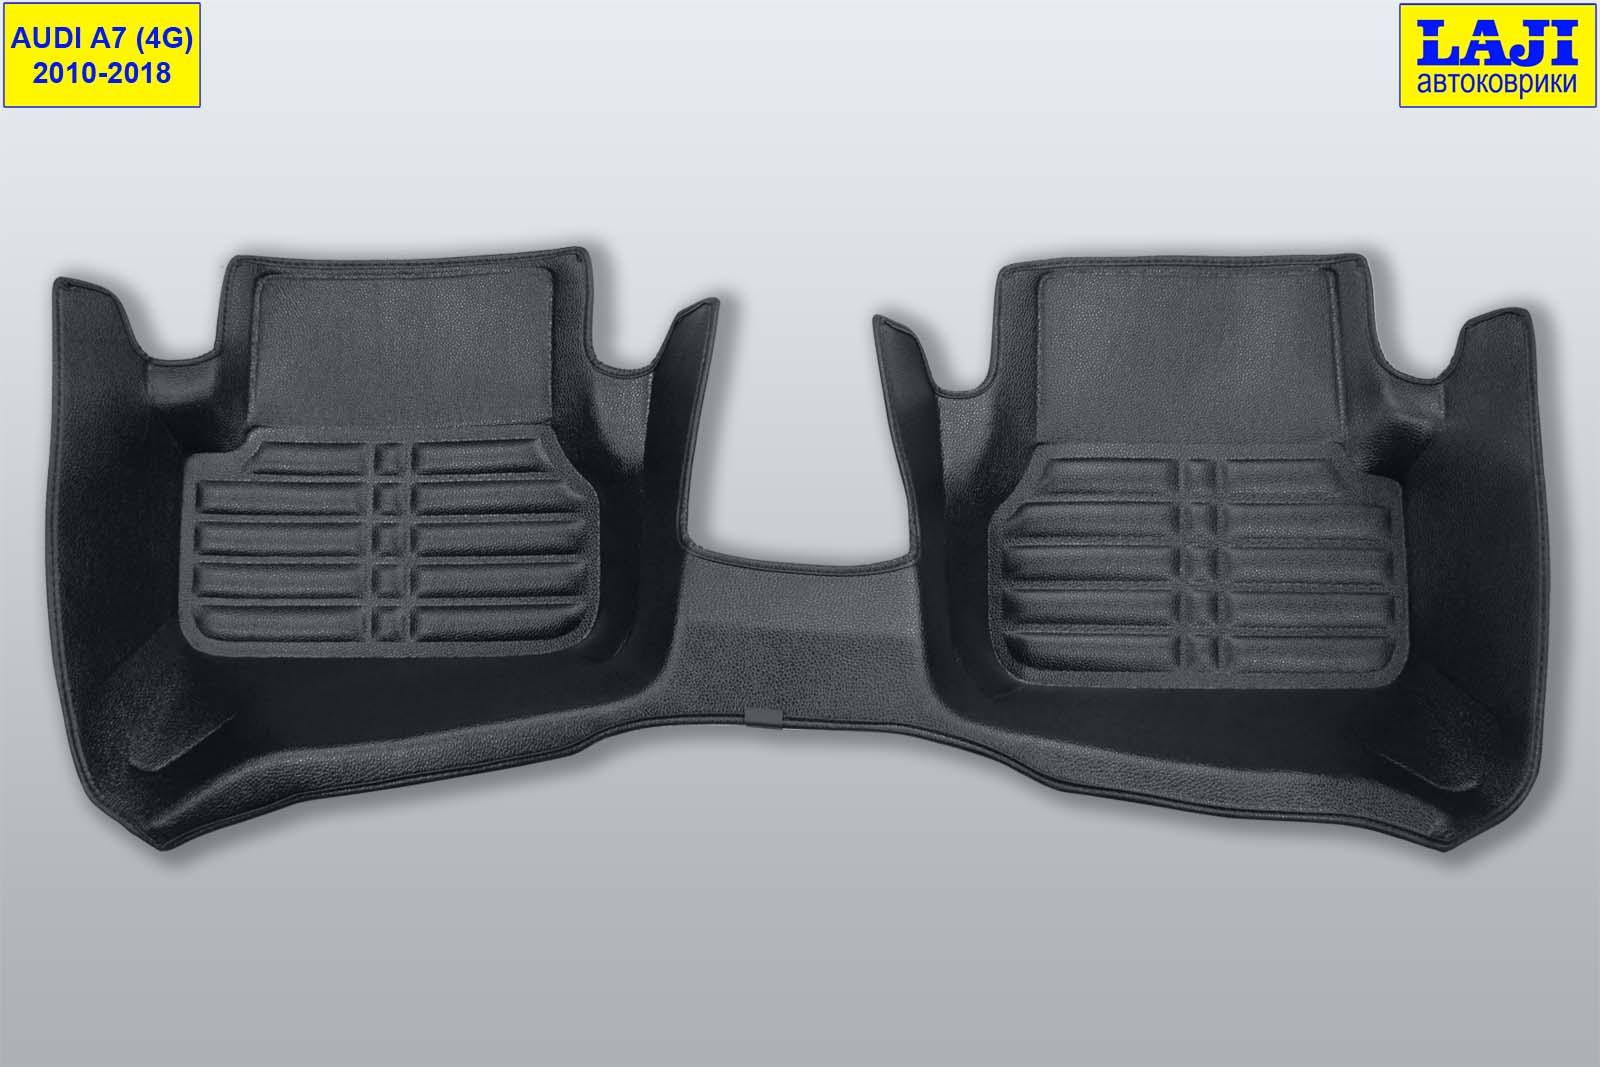 5D коврики для Audi A7 4G 2010-2018 10